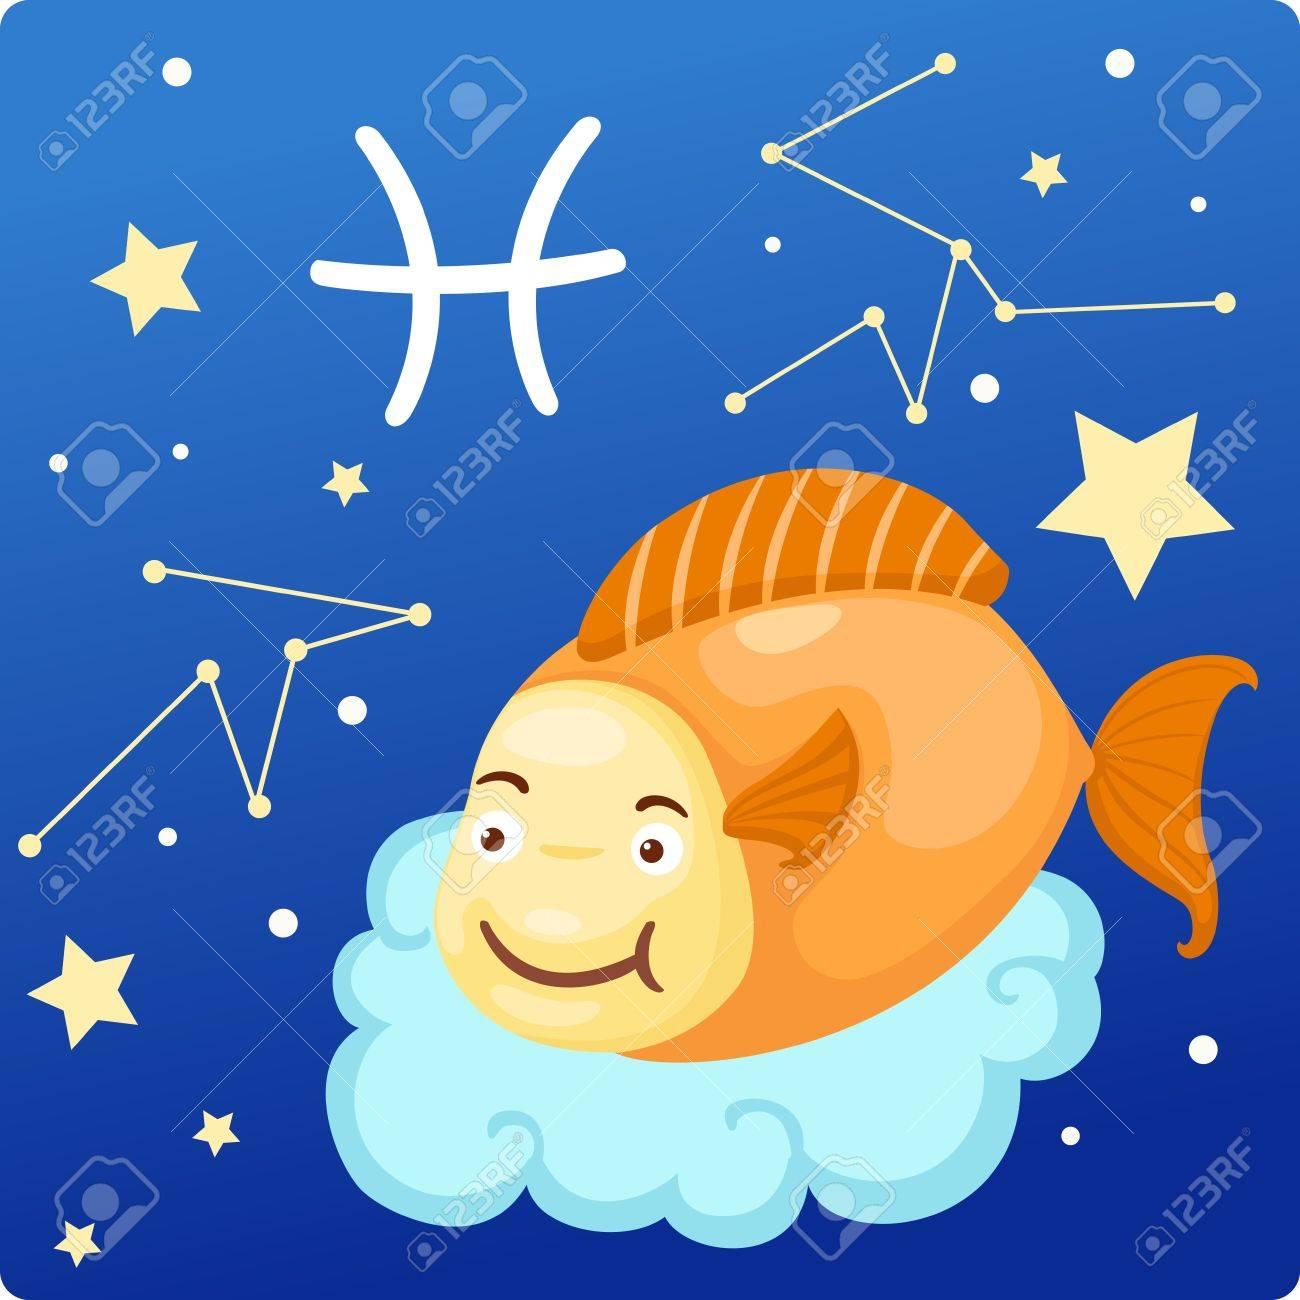 Zodiac signs - Pisces Illustration Stock Vector - 17848819